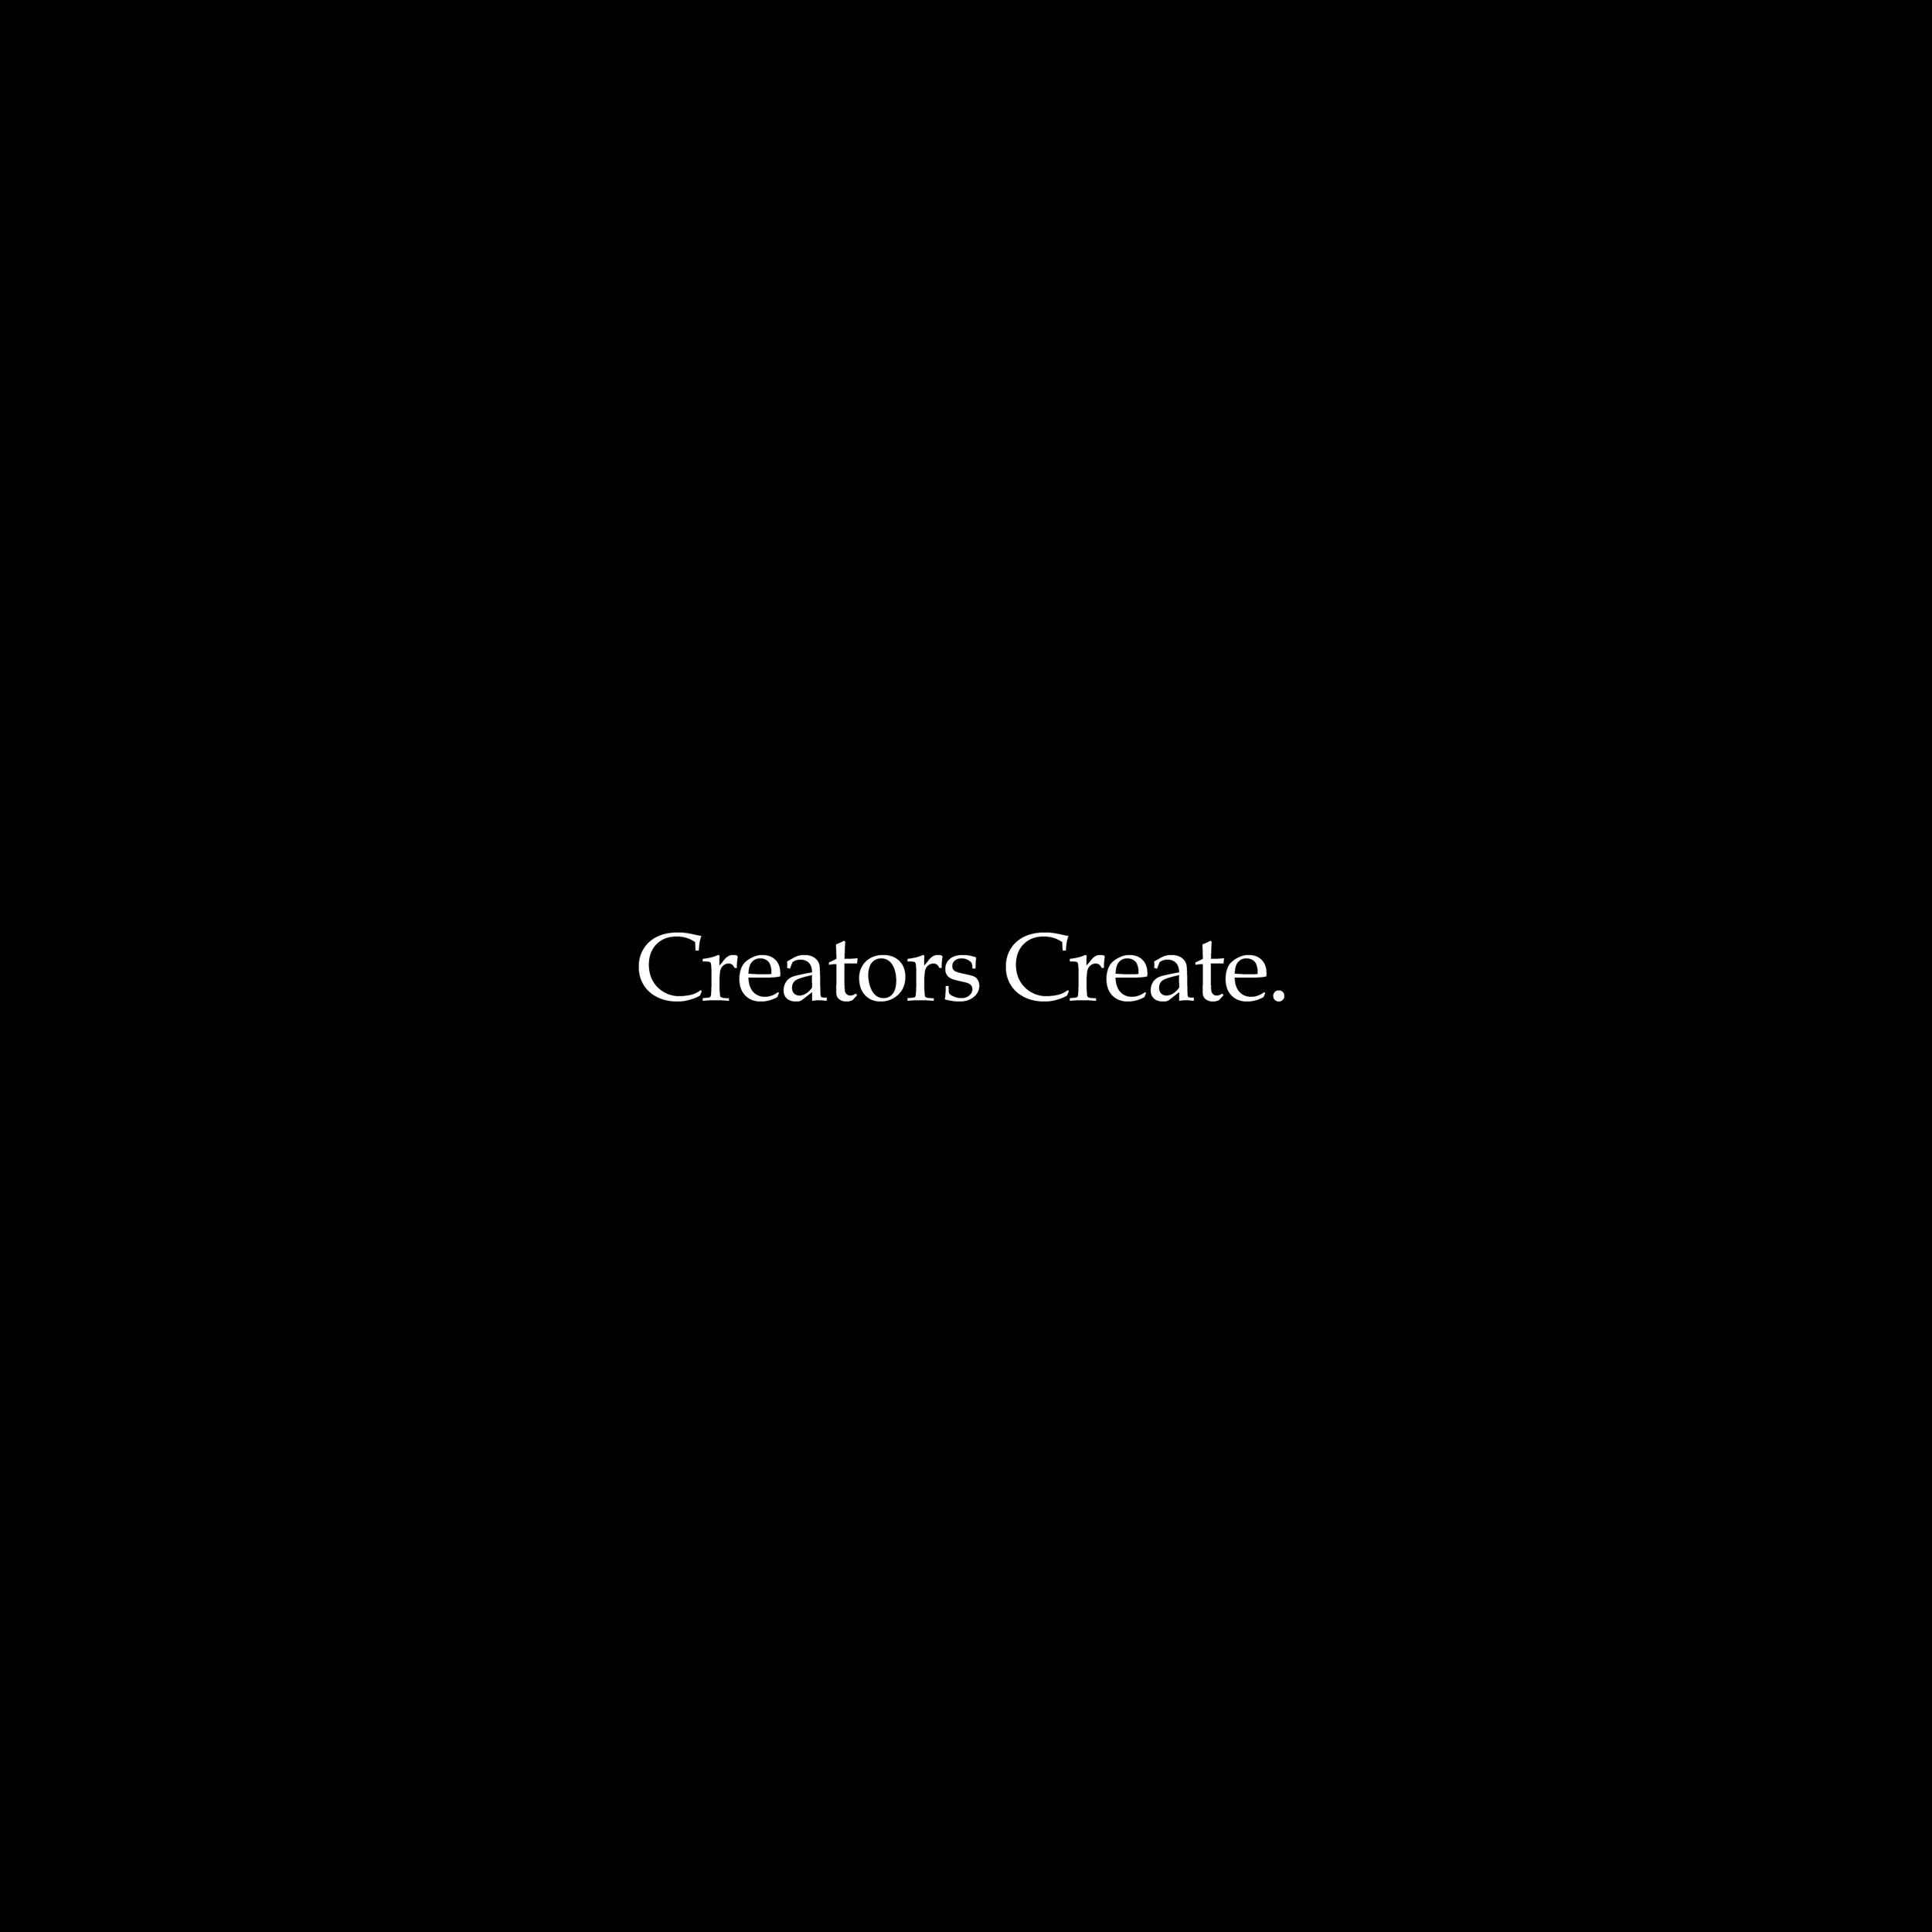 Creators Create.png